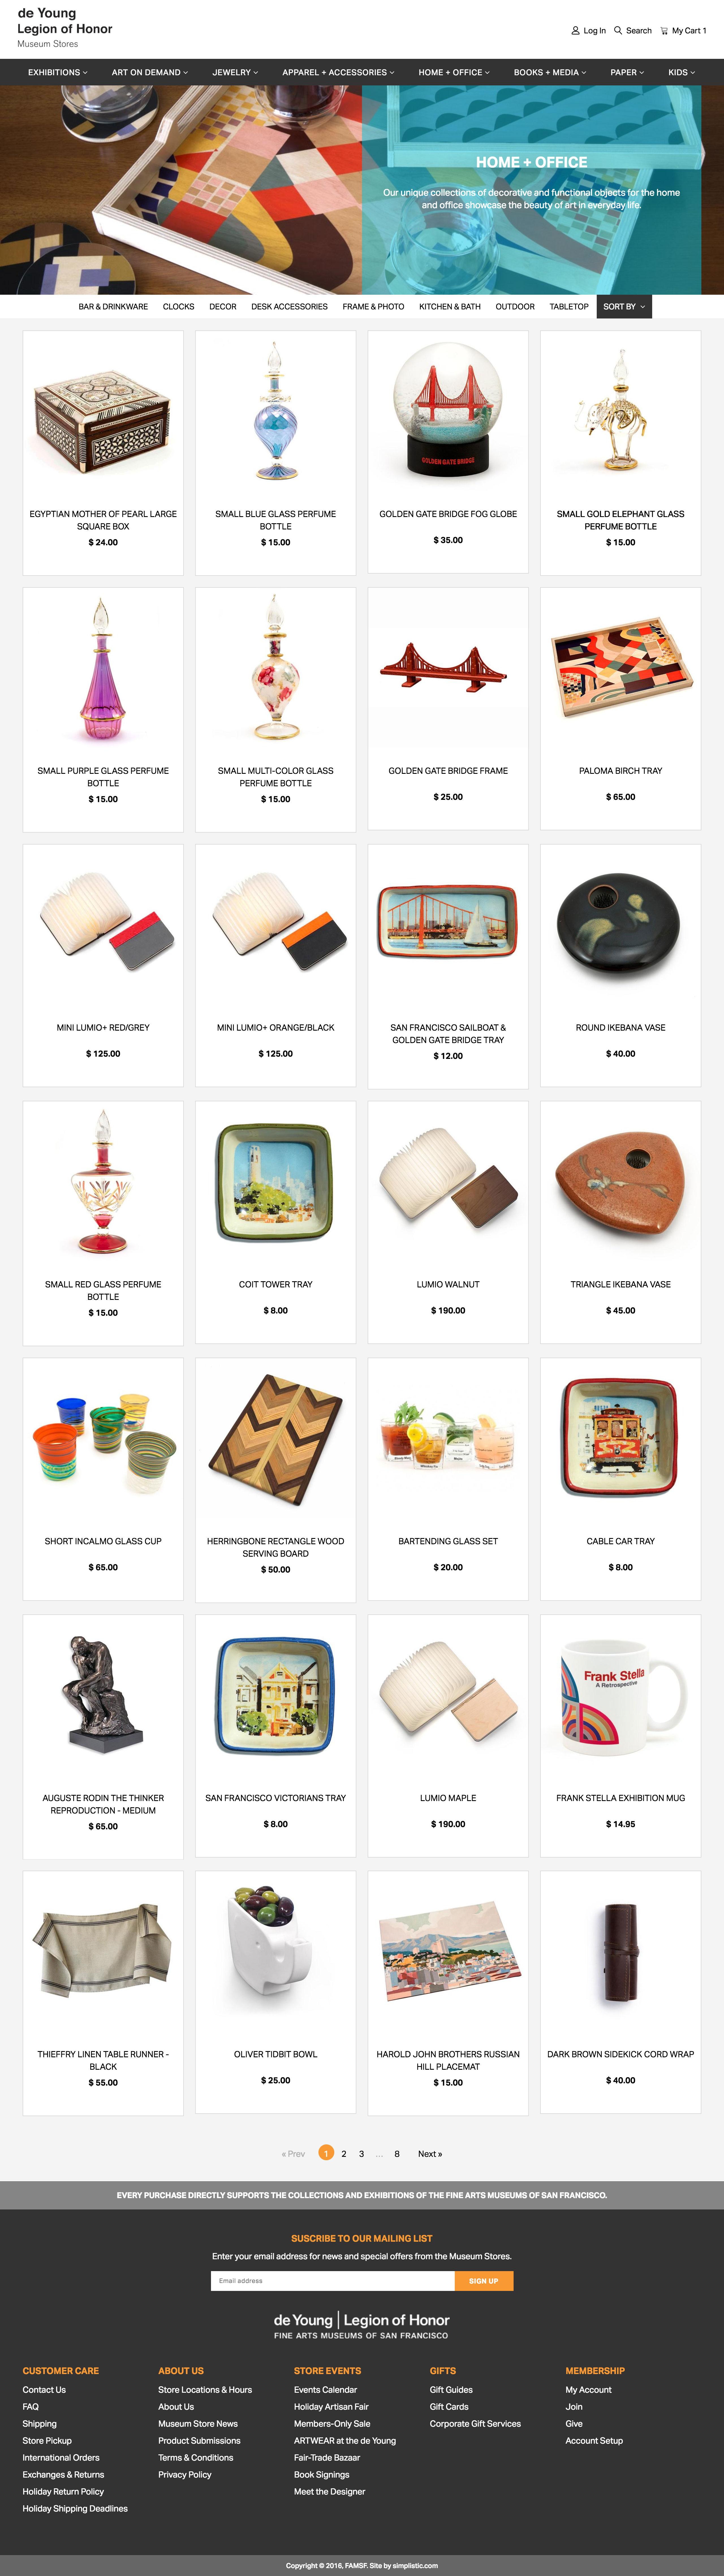 shopify plus migration for famsf shoppad